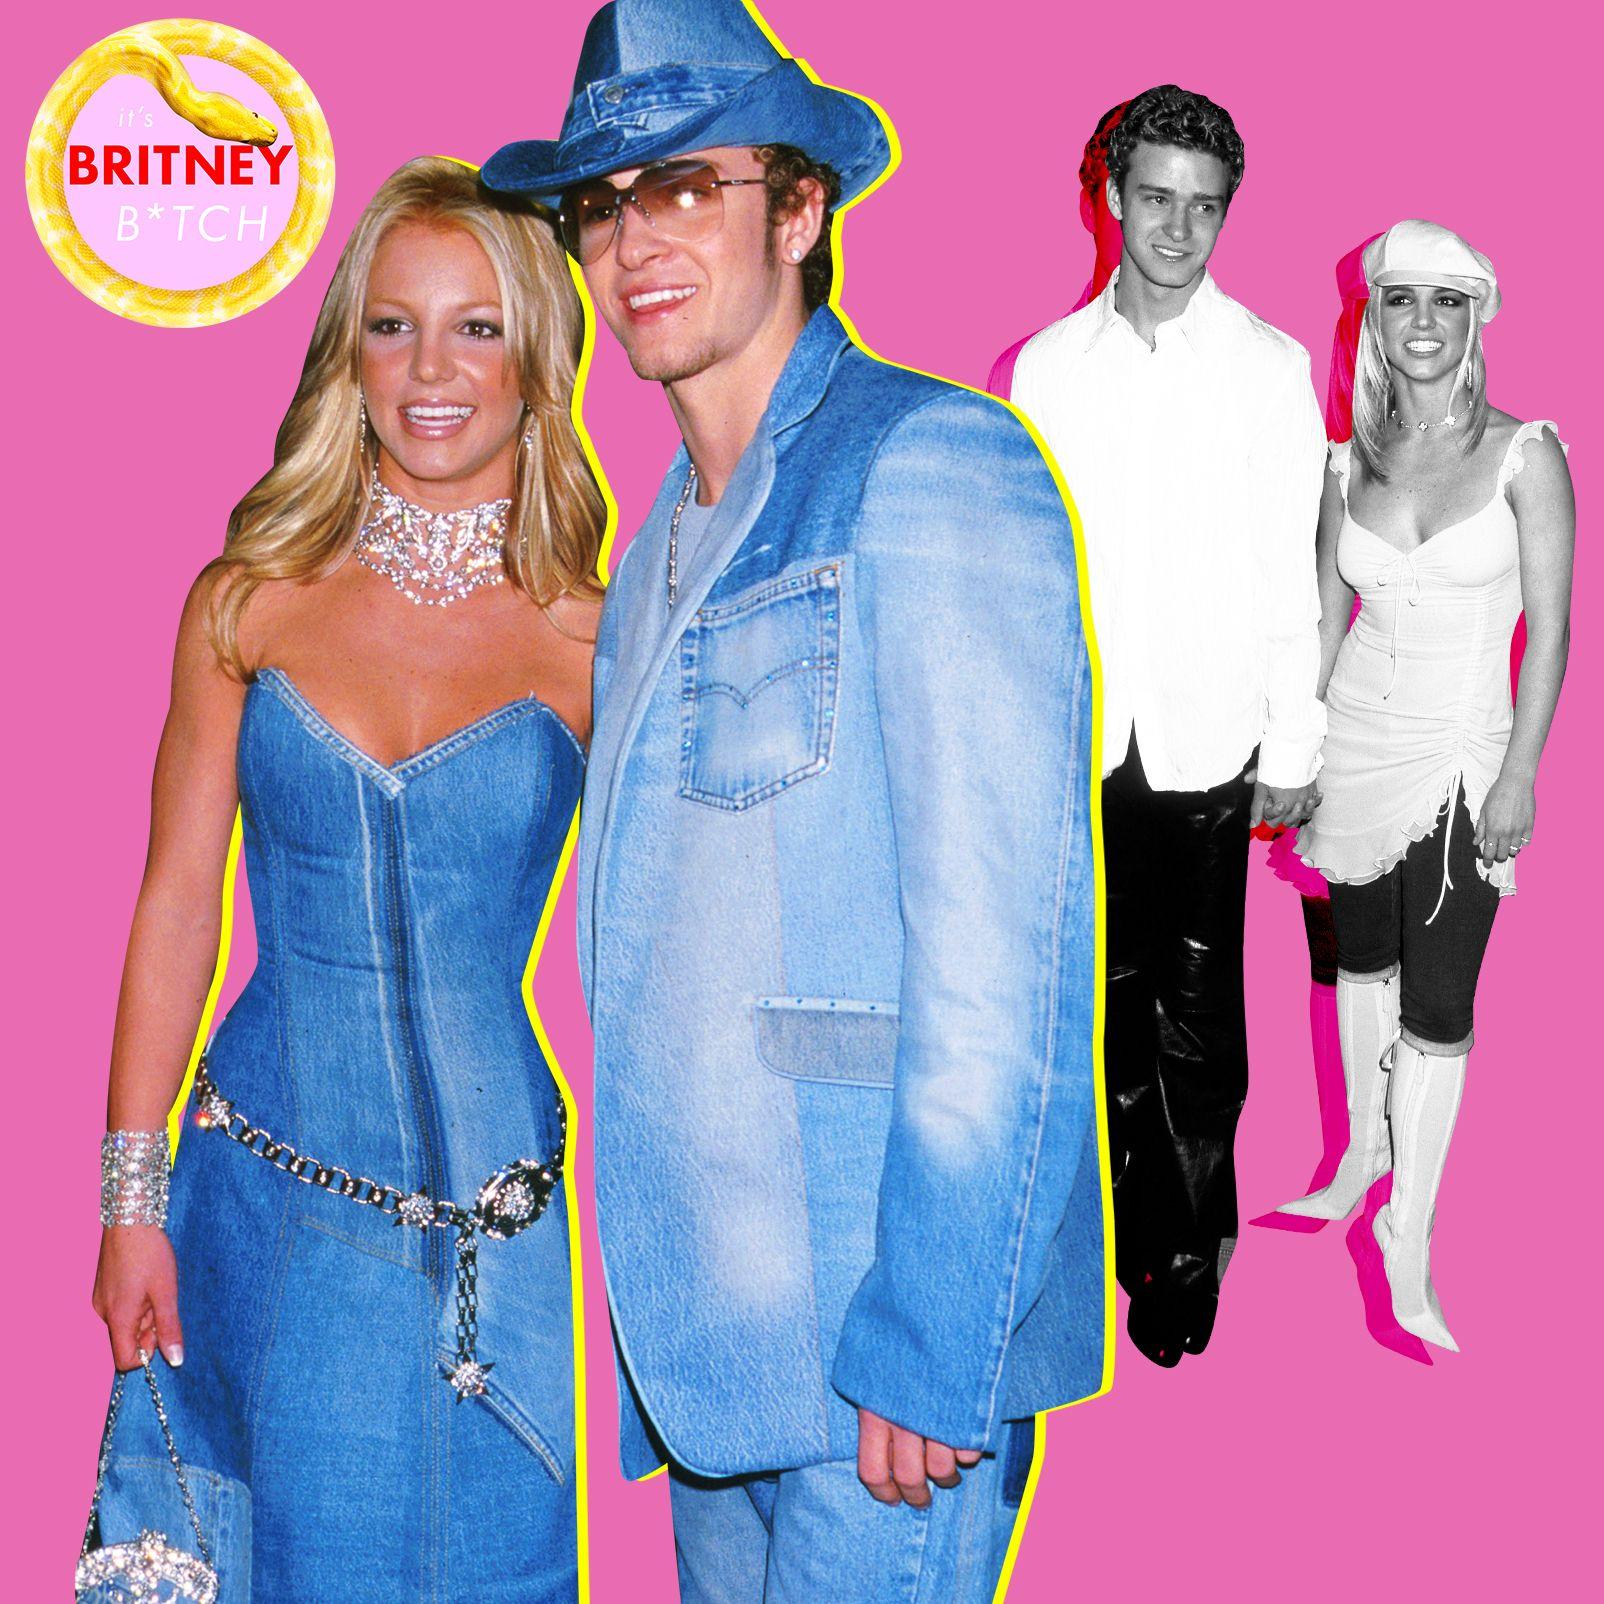 Britney spears justin having sex